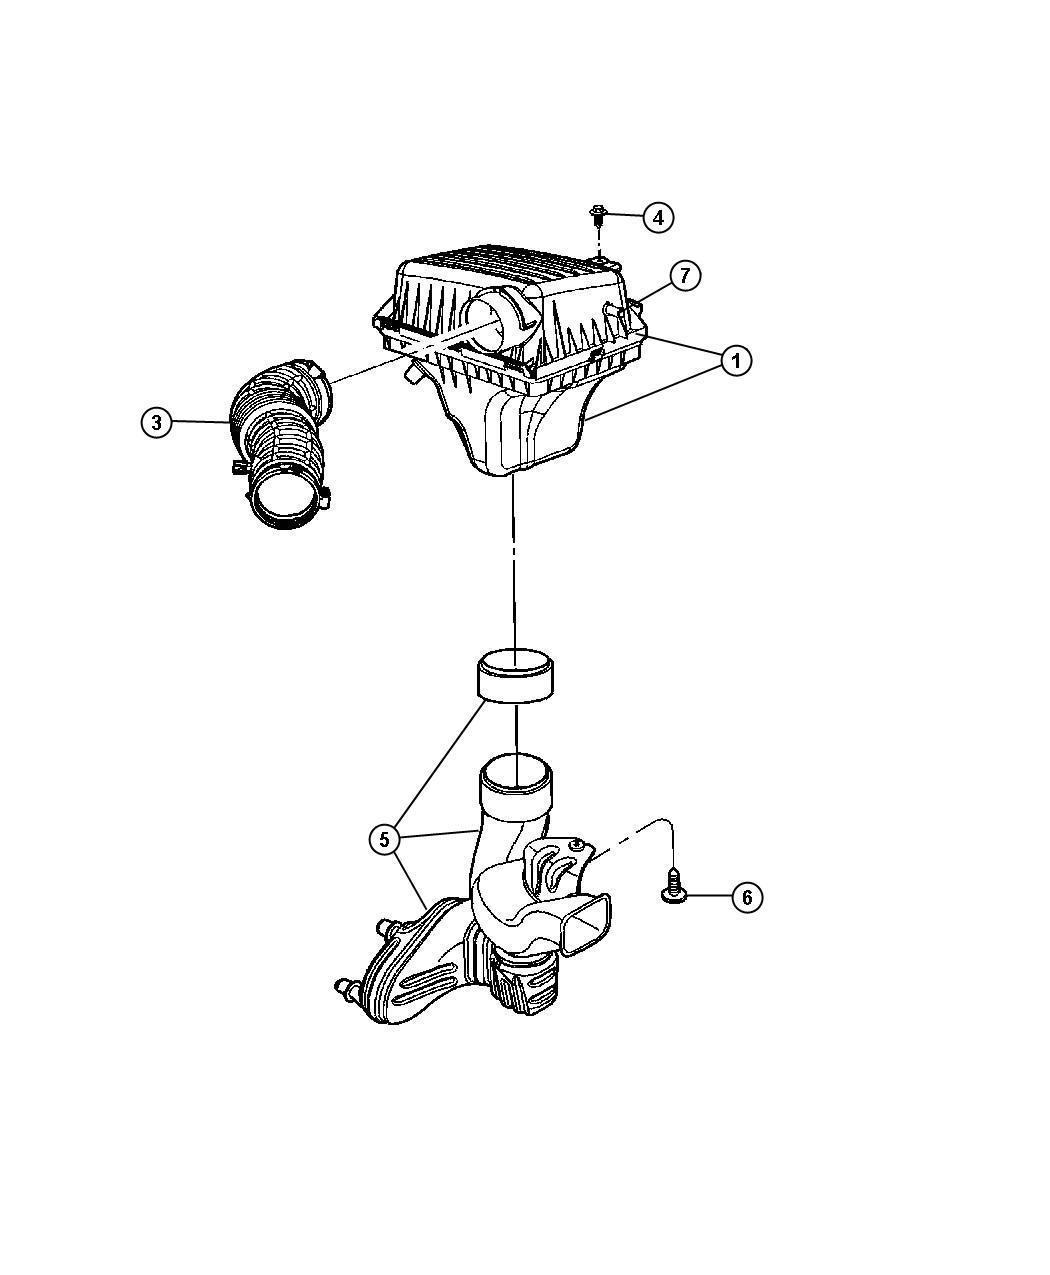 Dodge Magnum Screw. Hex head. Headlamp module, headlamp